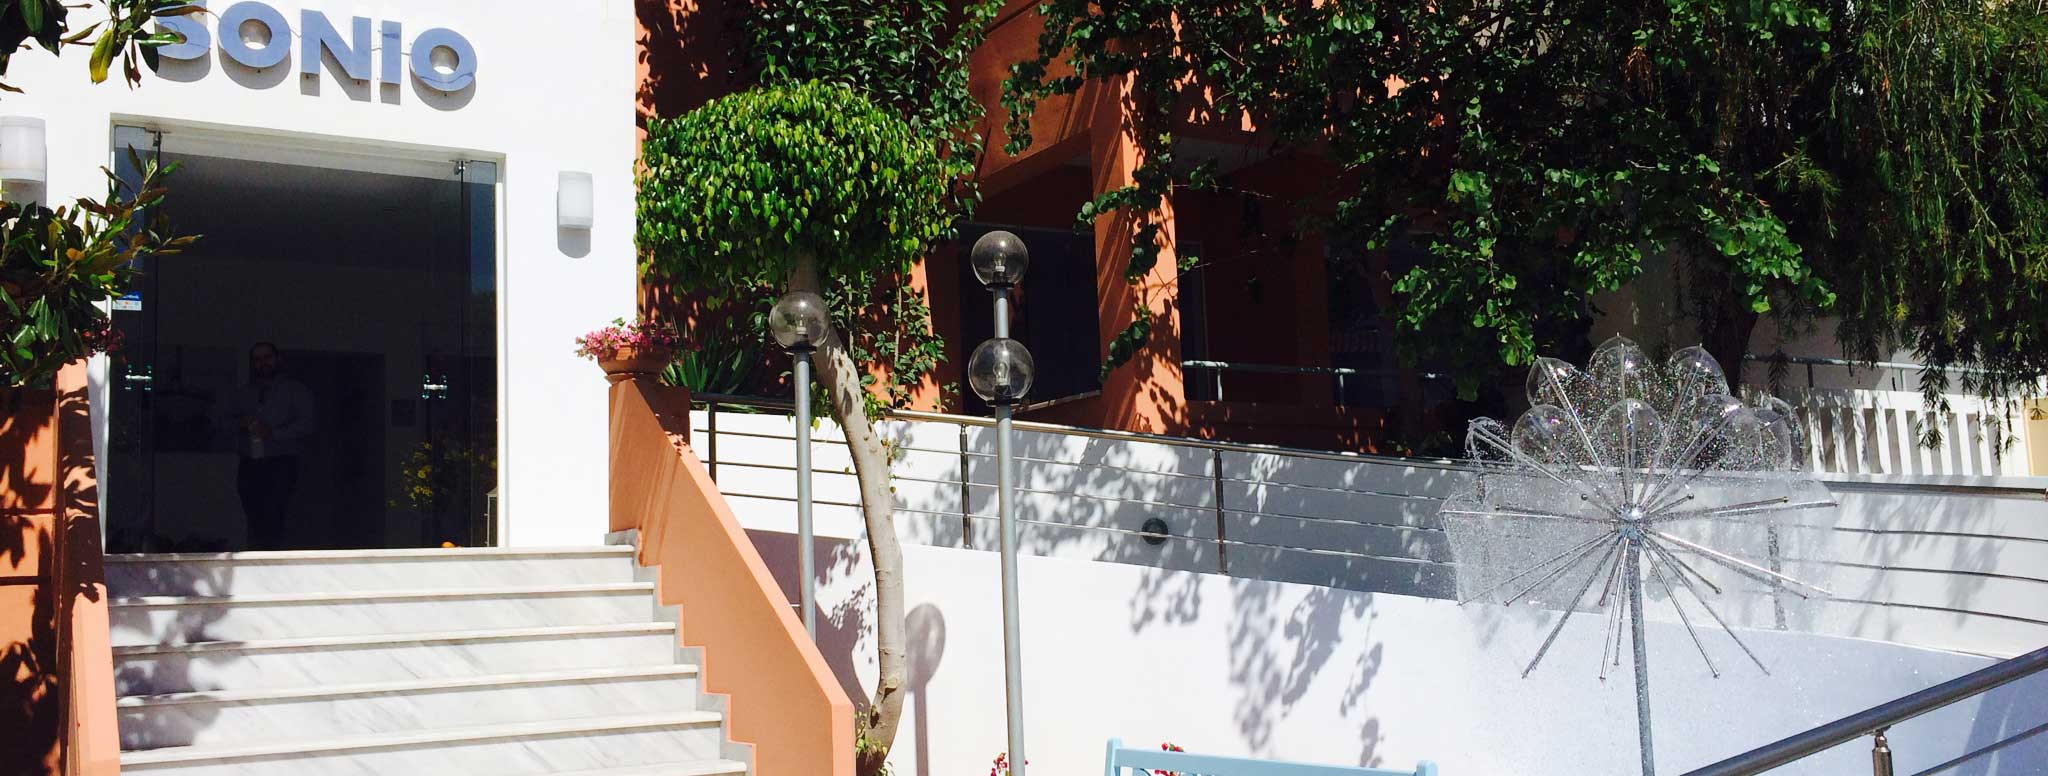 Sonio Beach Hotel - Sonio Beach-Entrance